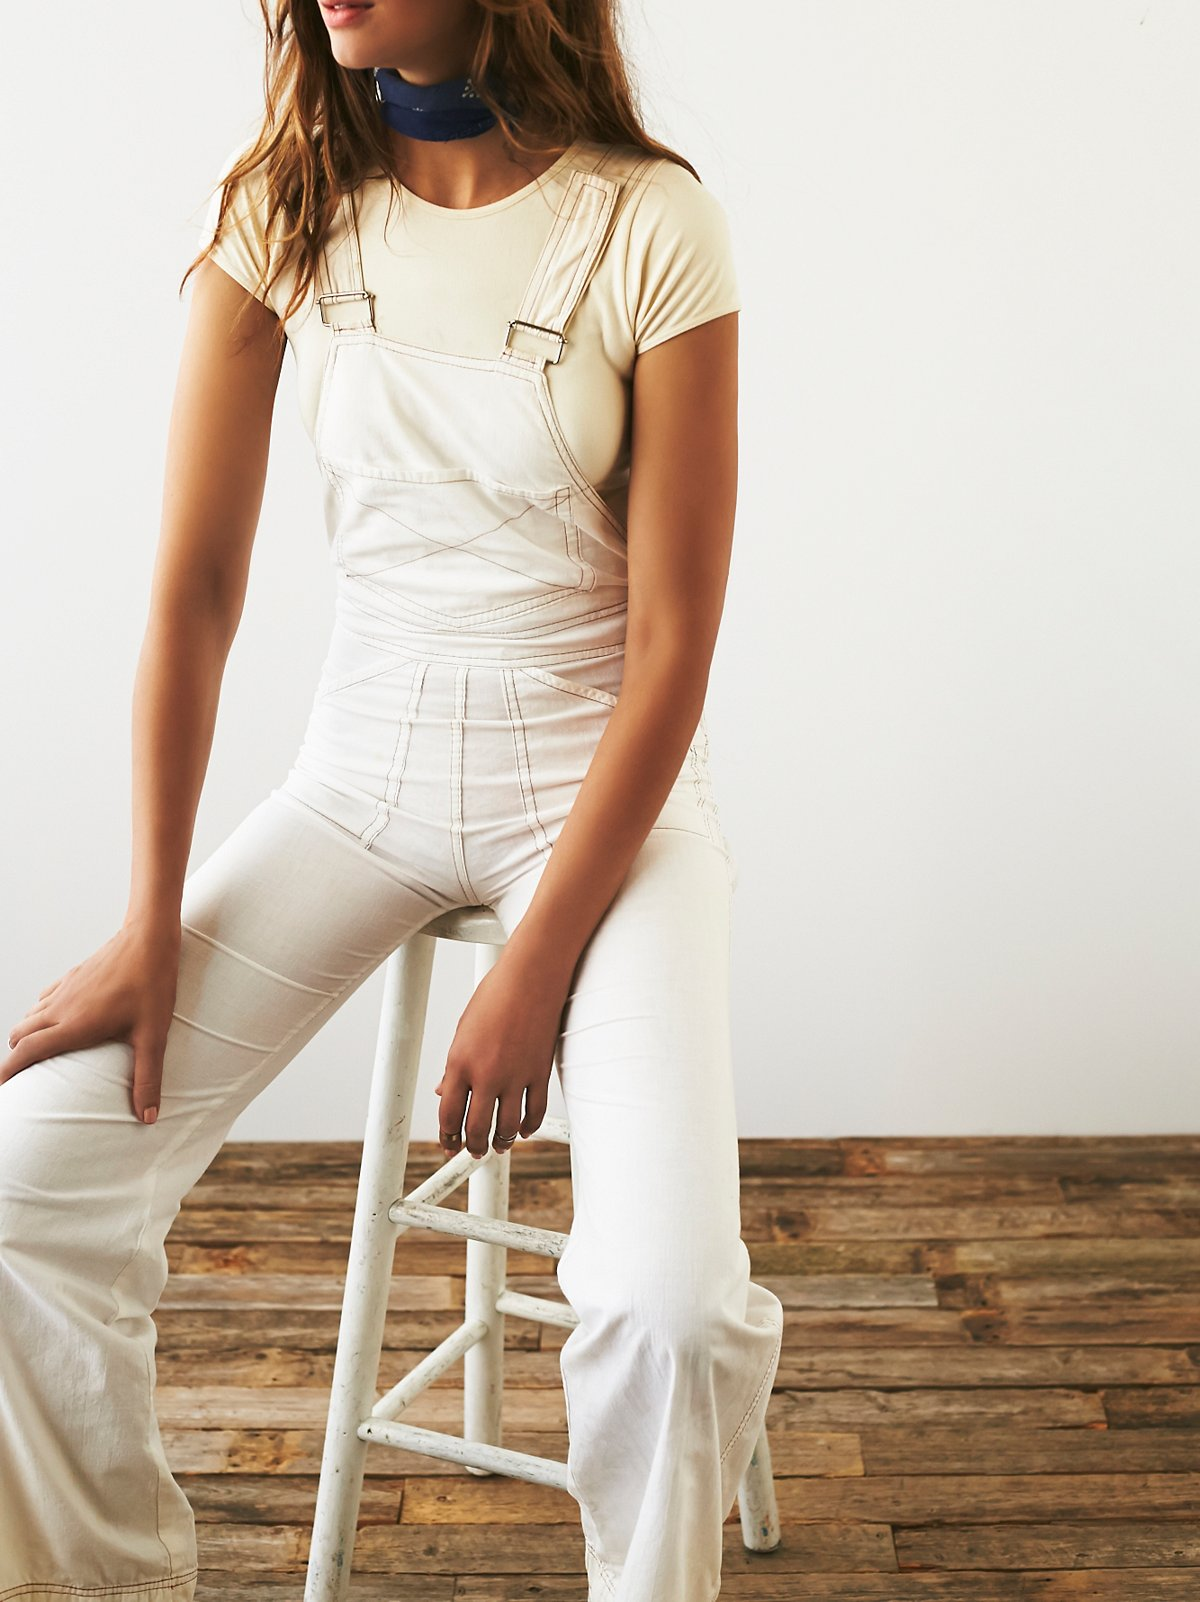 Vintage 1970s White Overalls